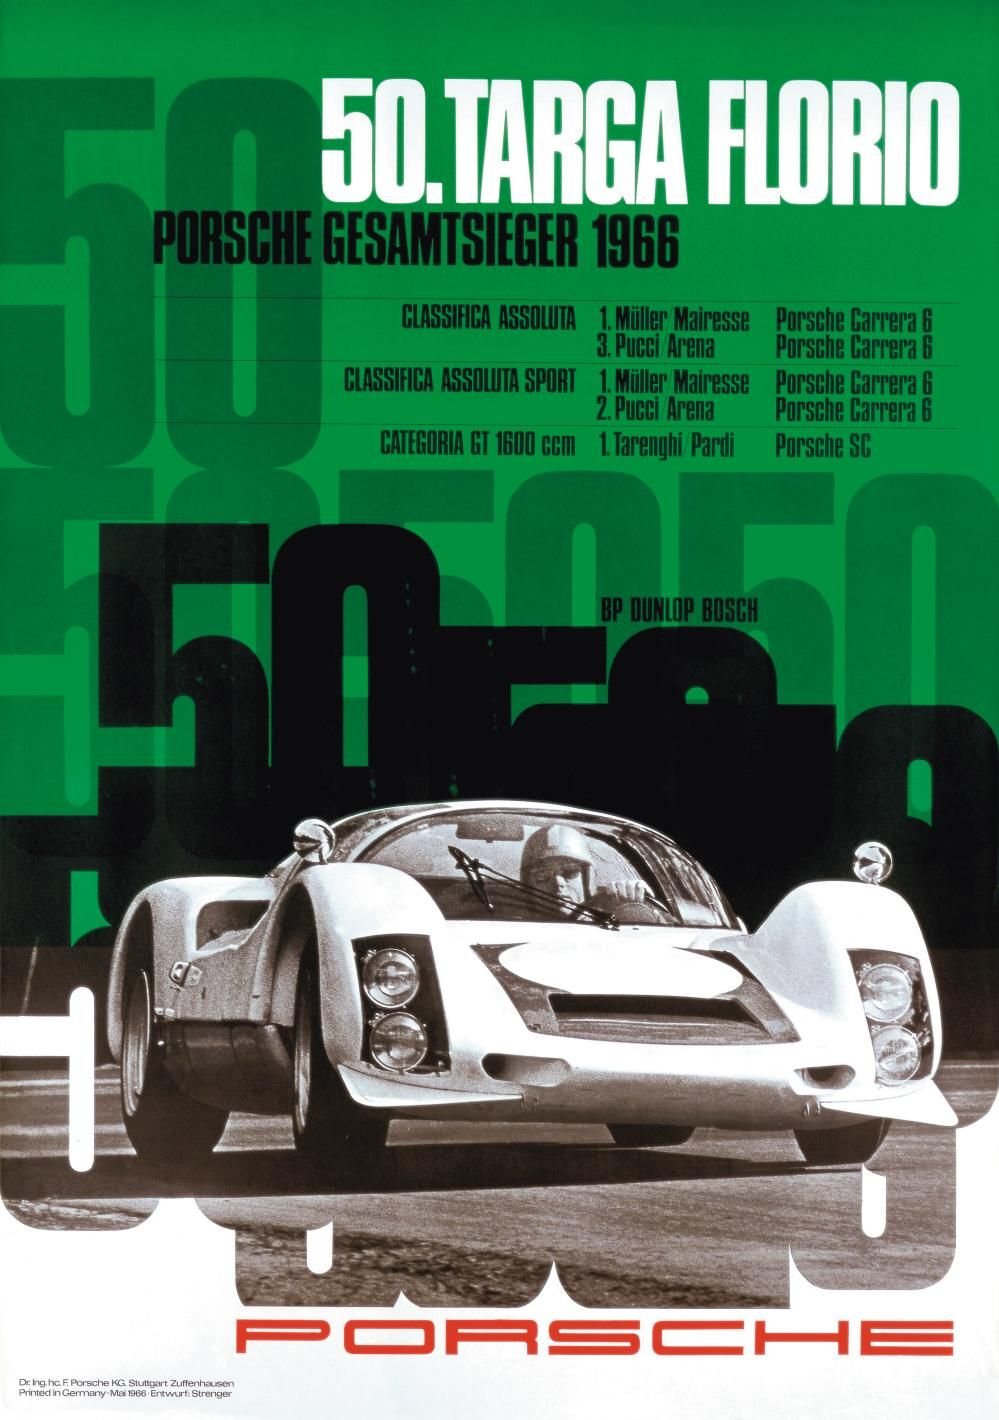 Vintage 1966 Dunlop Car Racing Poster